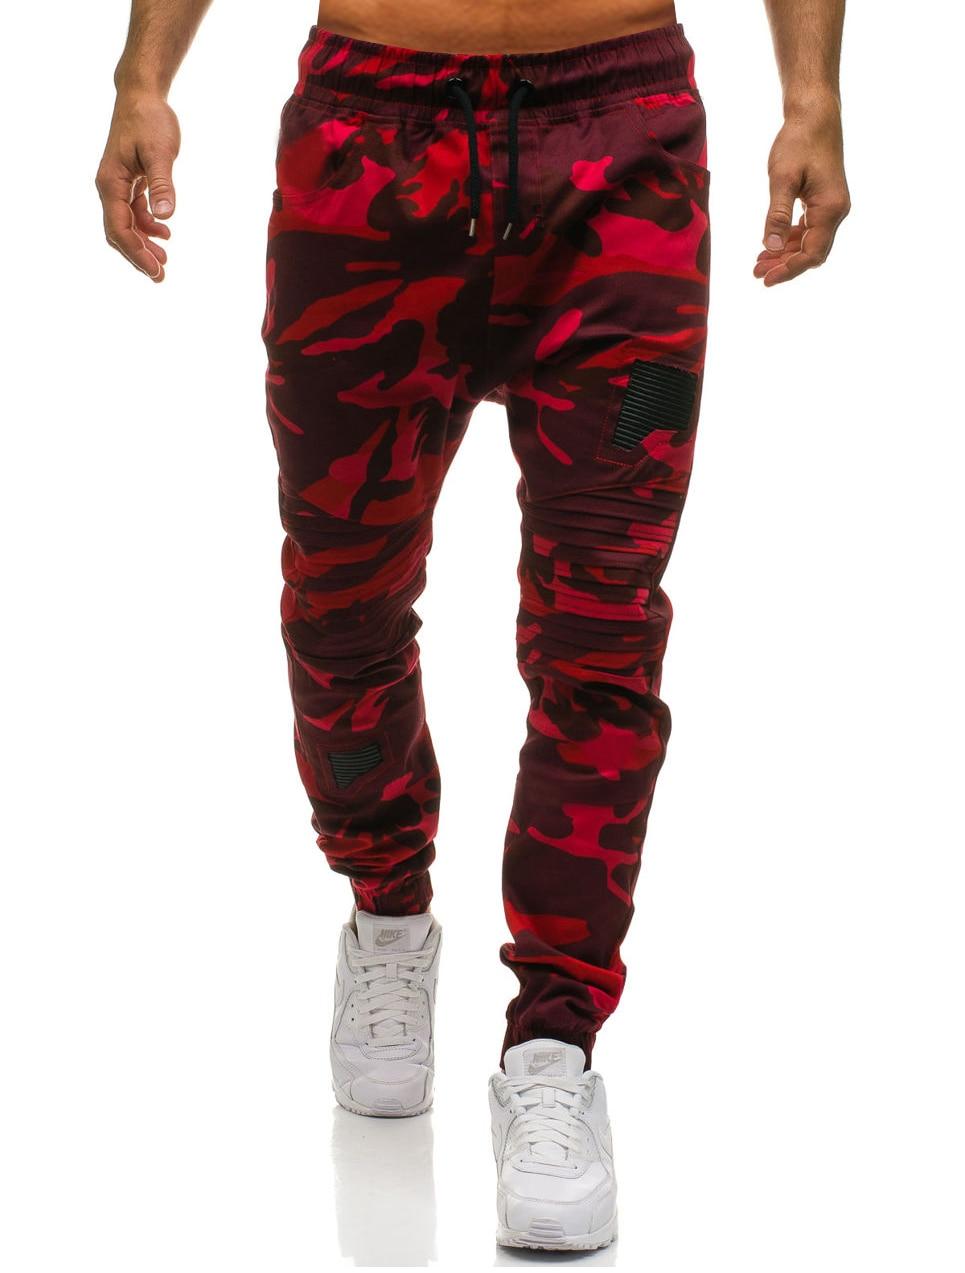 Men Sweatpants Casual Pants Slim fit Drawstring Sweatpants Slacks Elastic Waist Patchwork Pleated Ultrathin Male Trousers Jogger 17